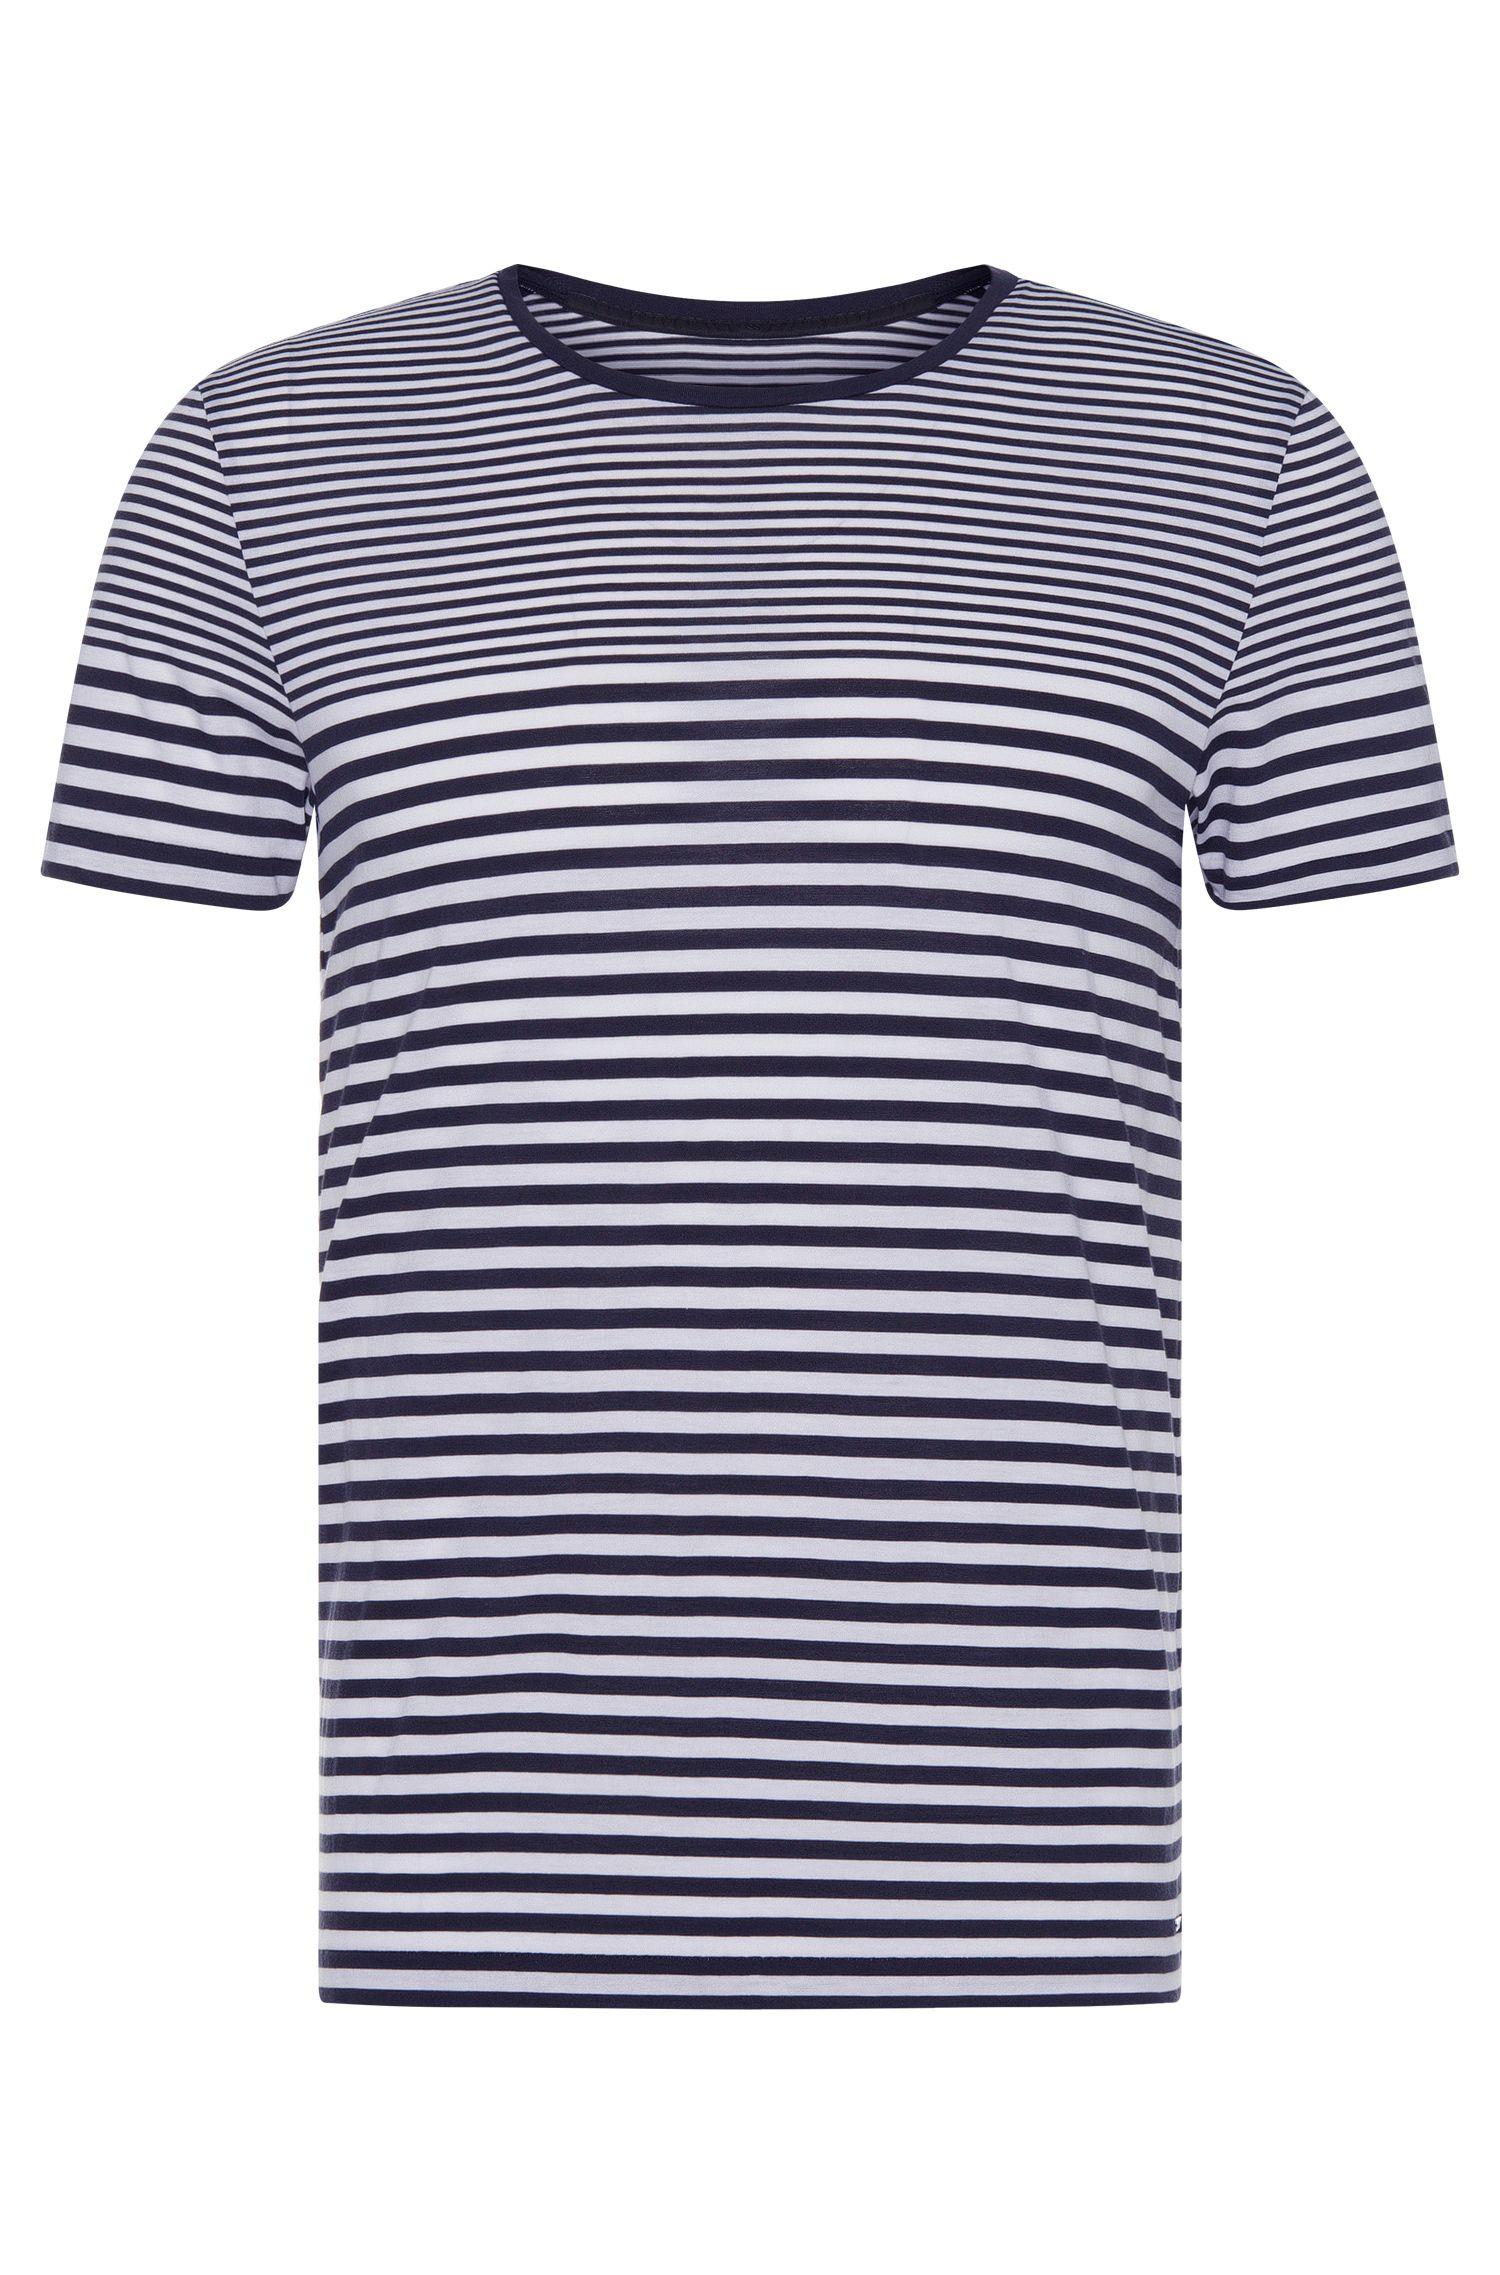 Cotton Engineered Stripe T-Shirt   Tessler WS